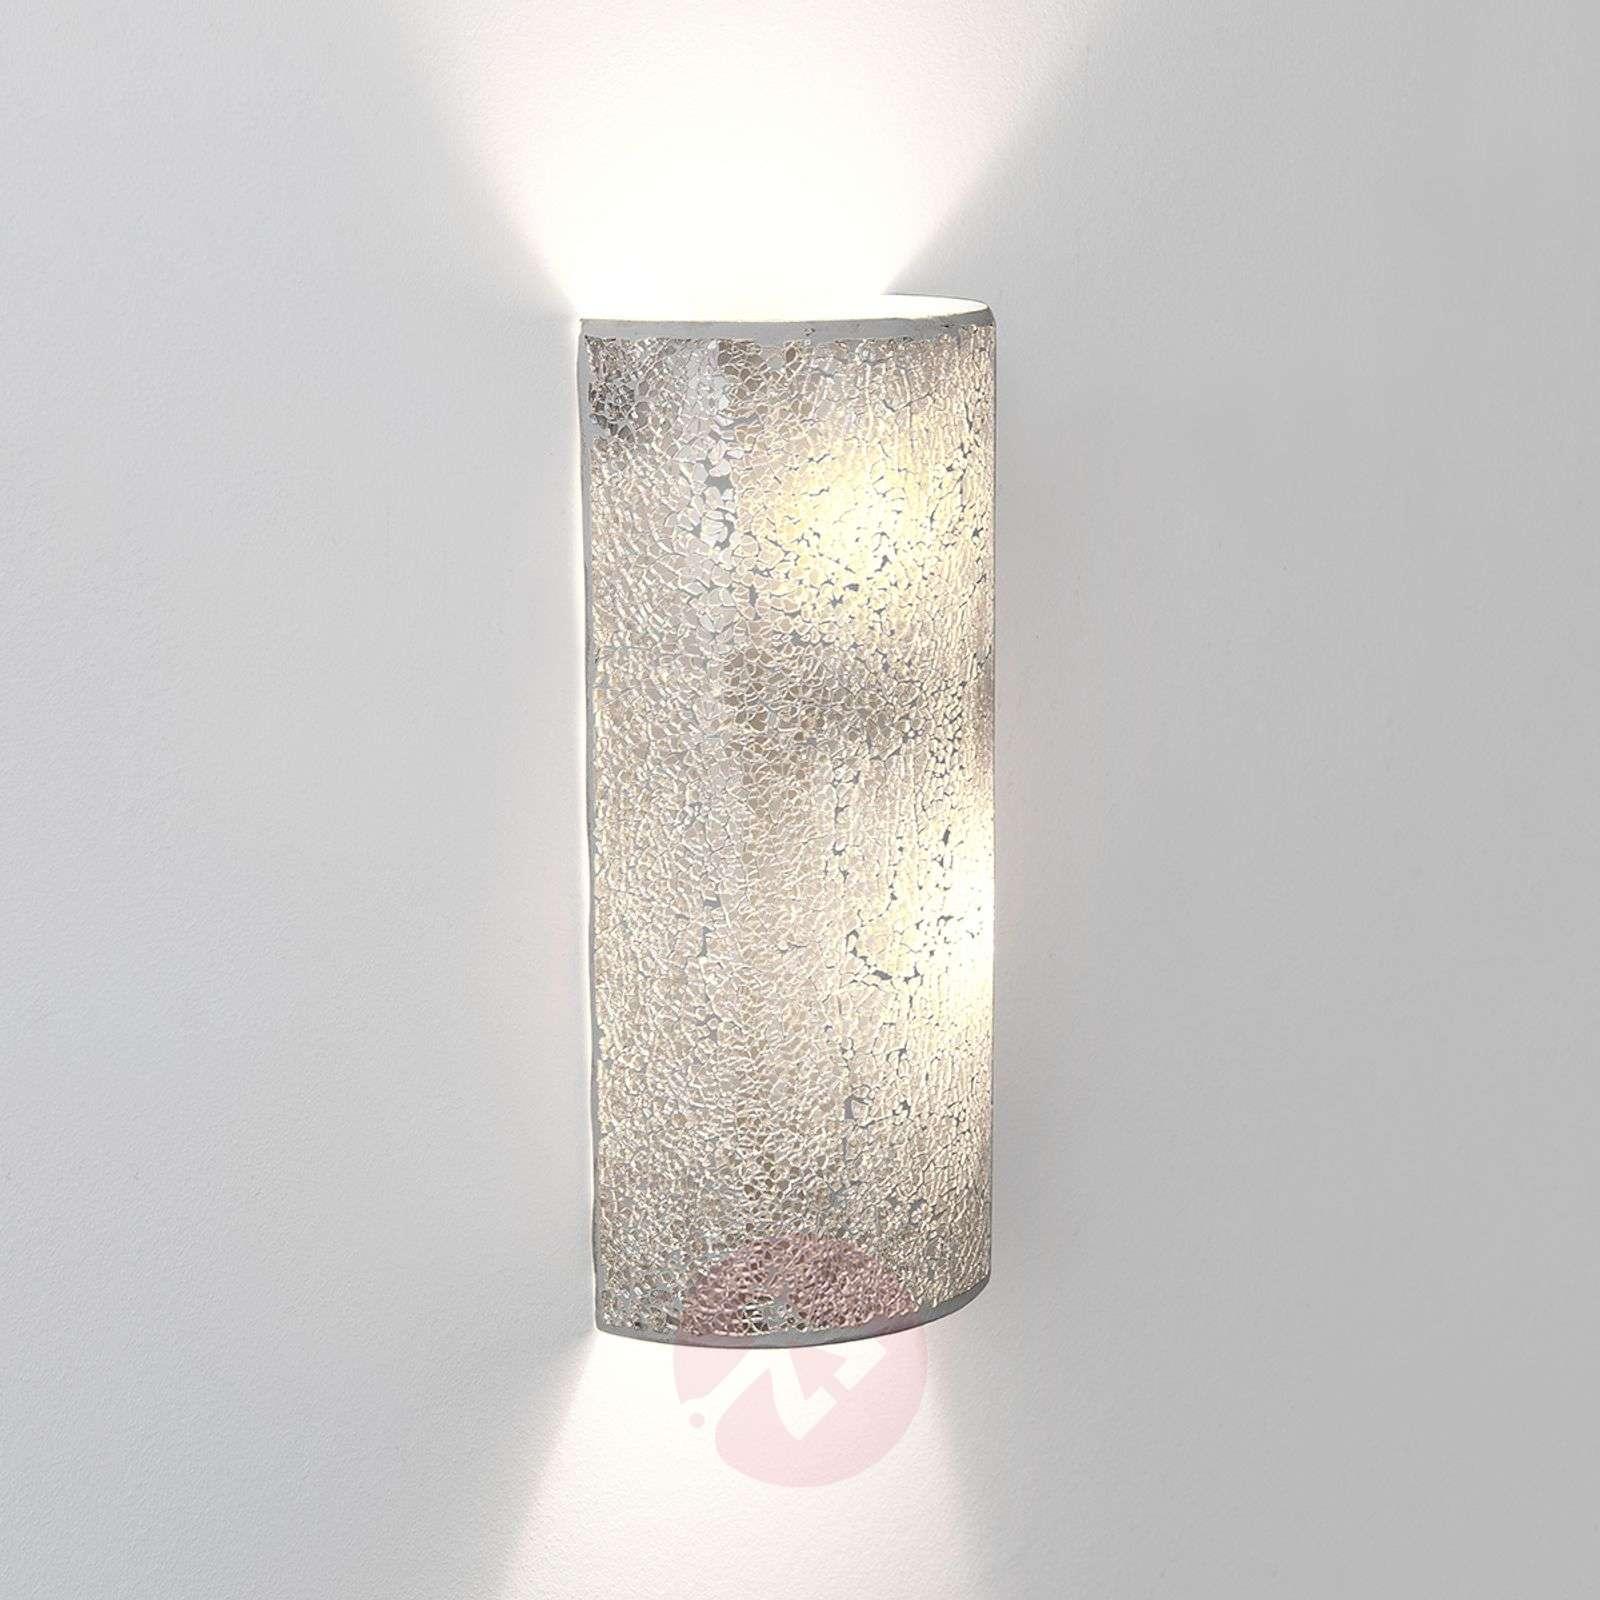 Narziso silver wall light made of glass mosaic-4512508-01